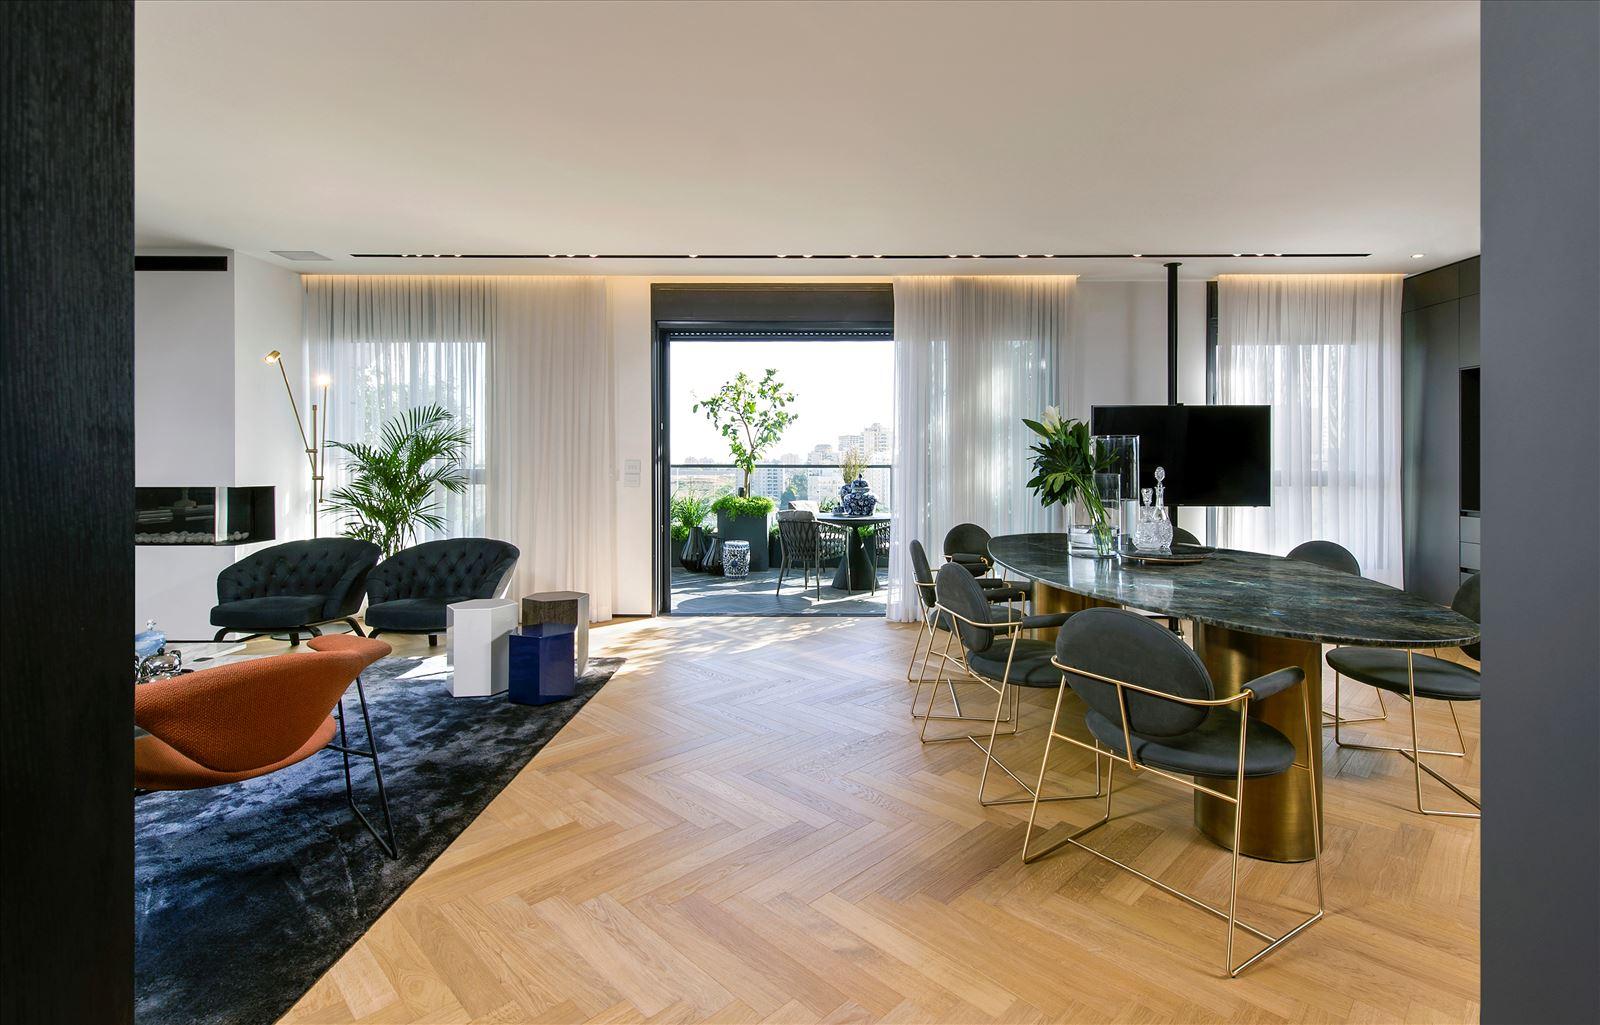 Penthouse - Petah Tikva גופי תאורה בתקרת הסלון מאירים את היציאה למרפסת בתכנון דורי קמחי